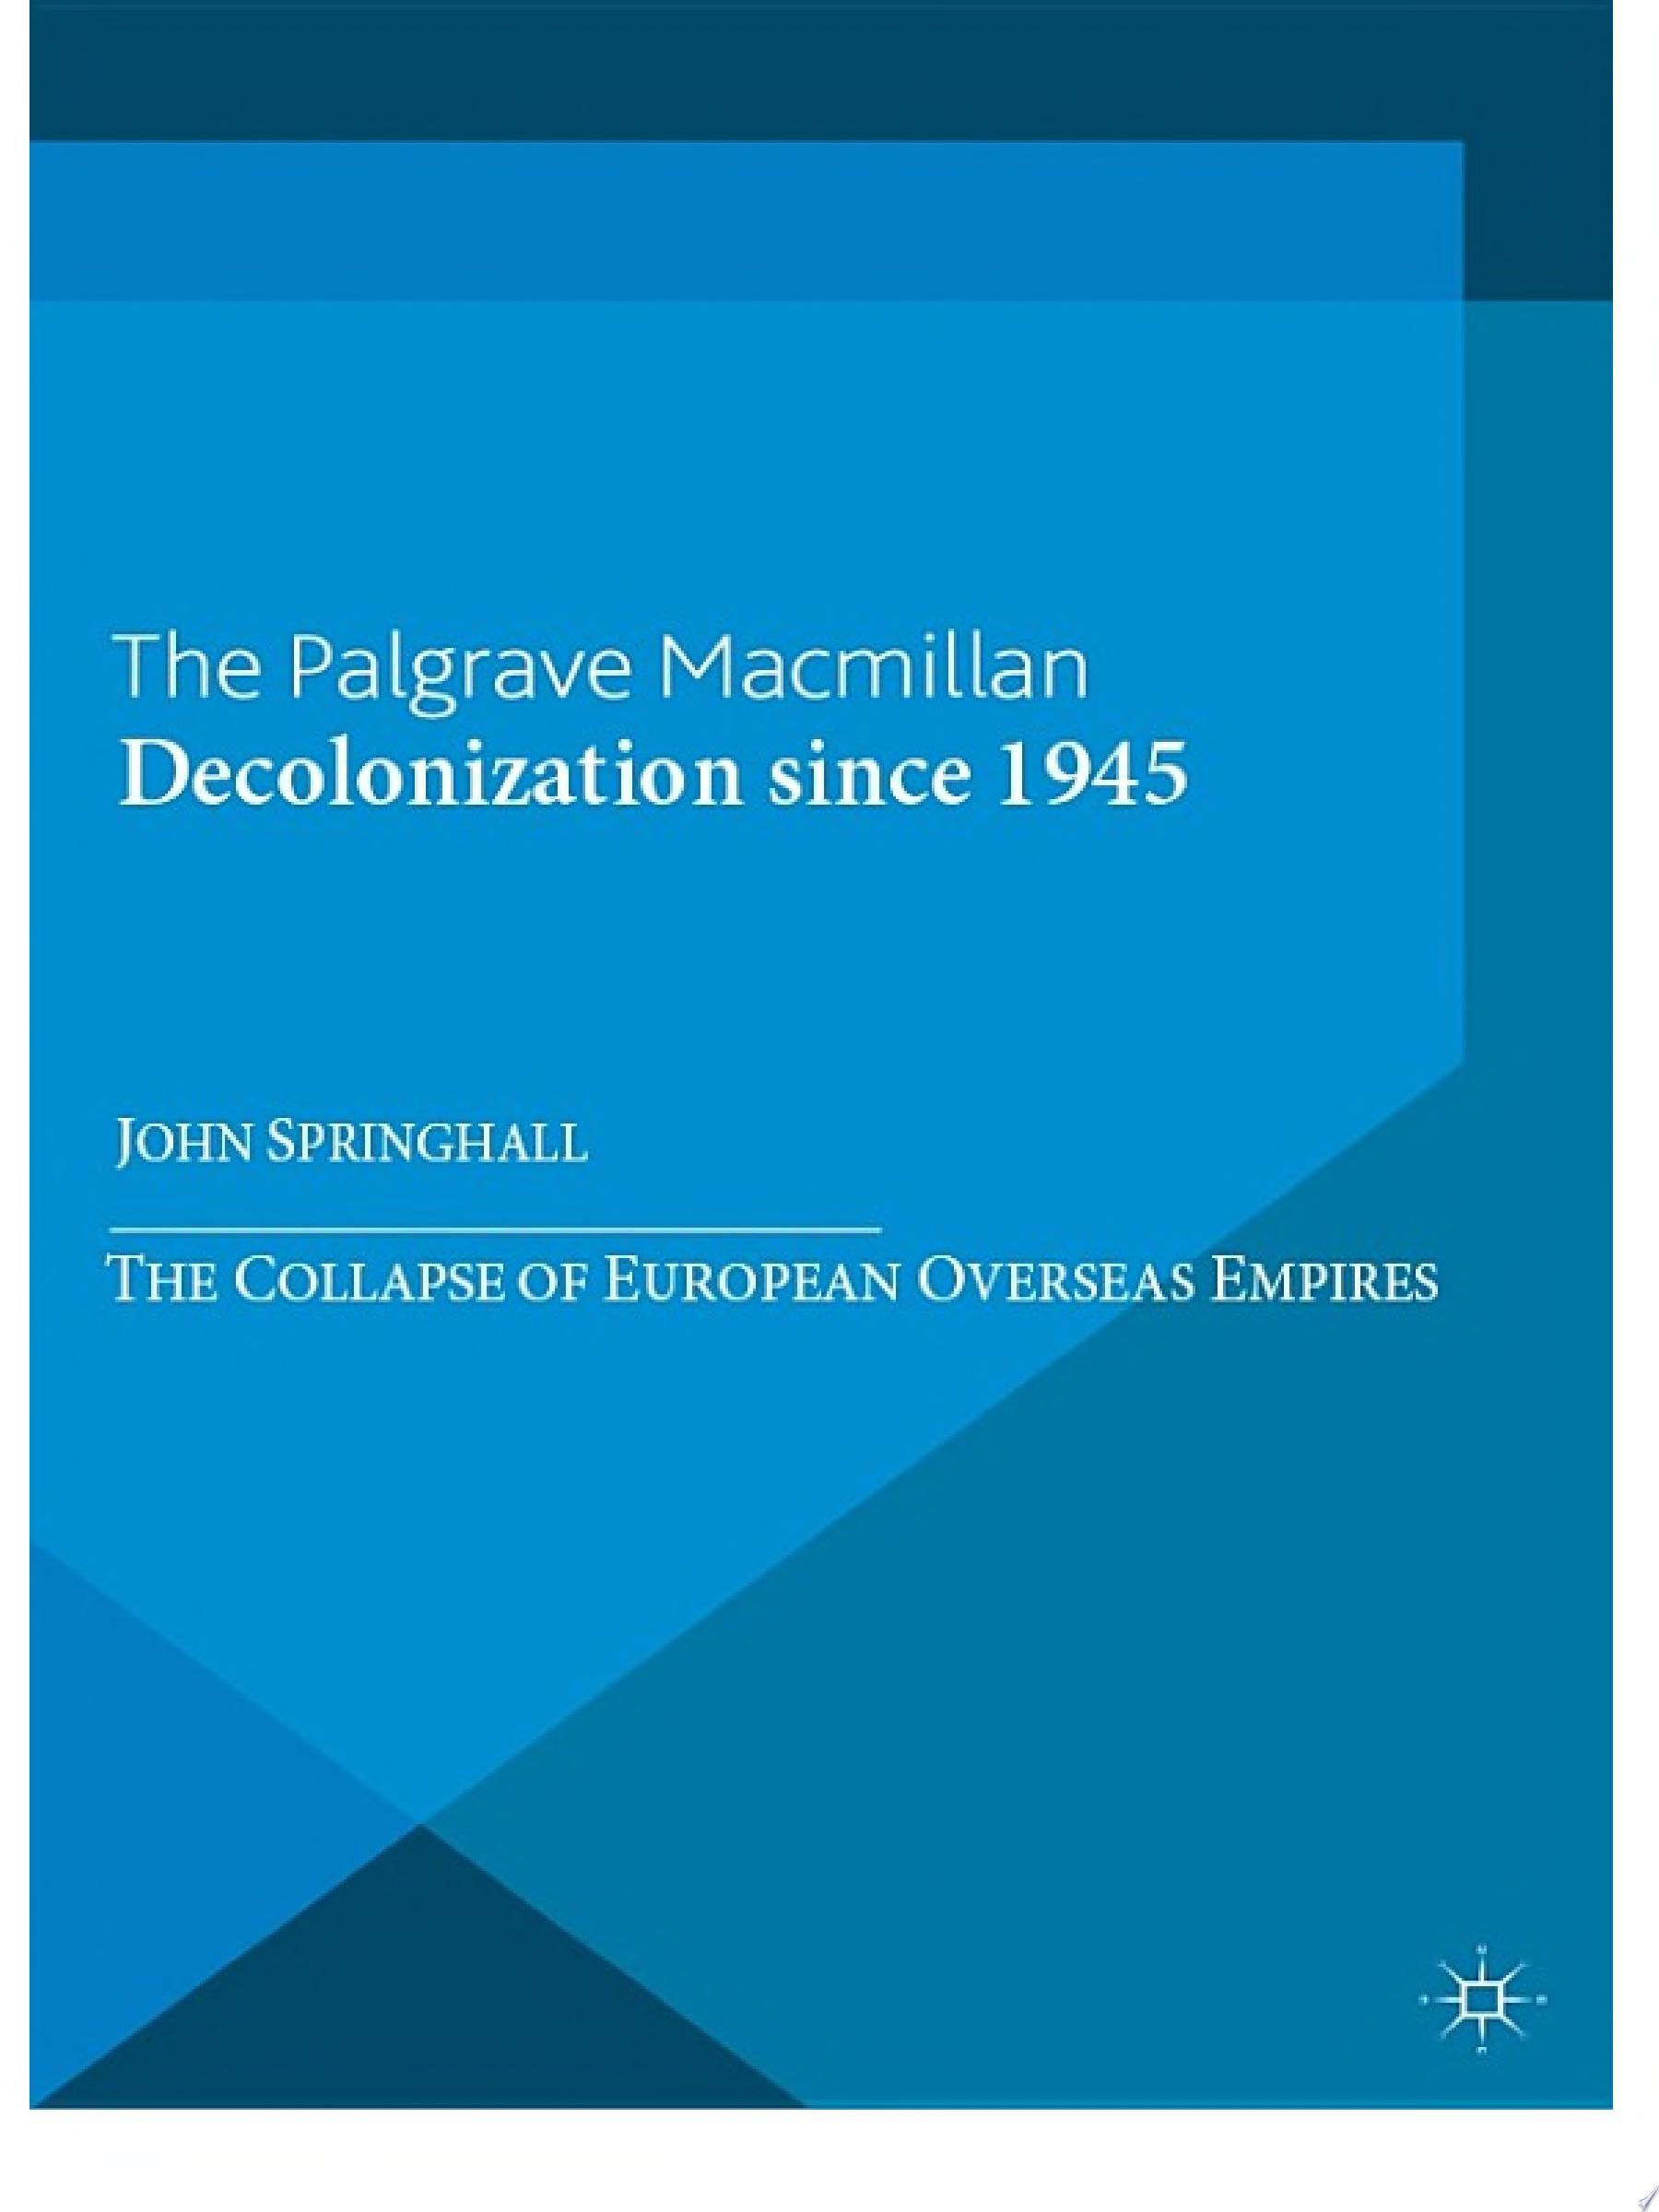 Decolonization since 1945